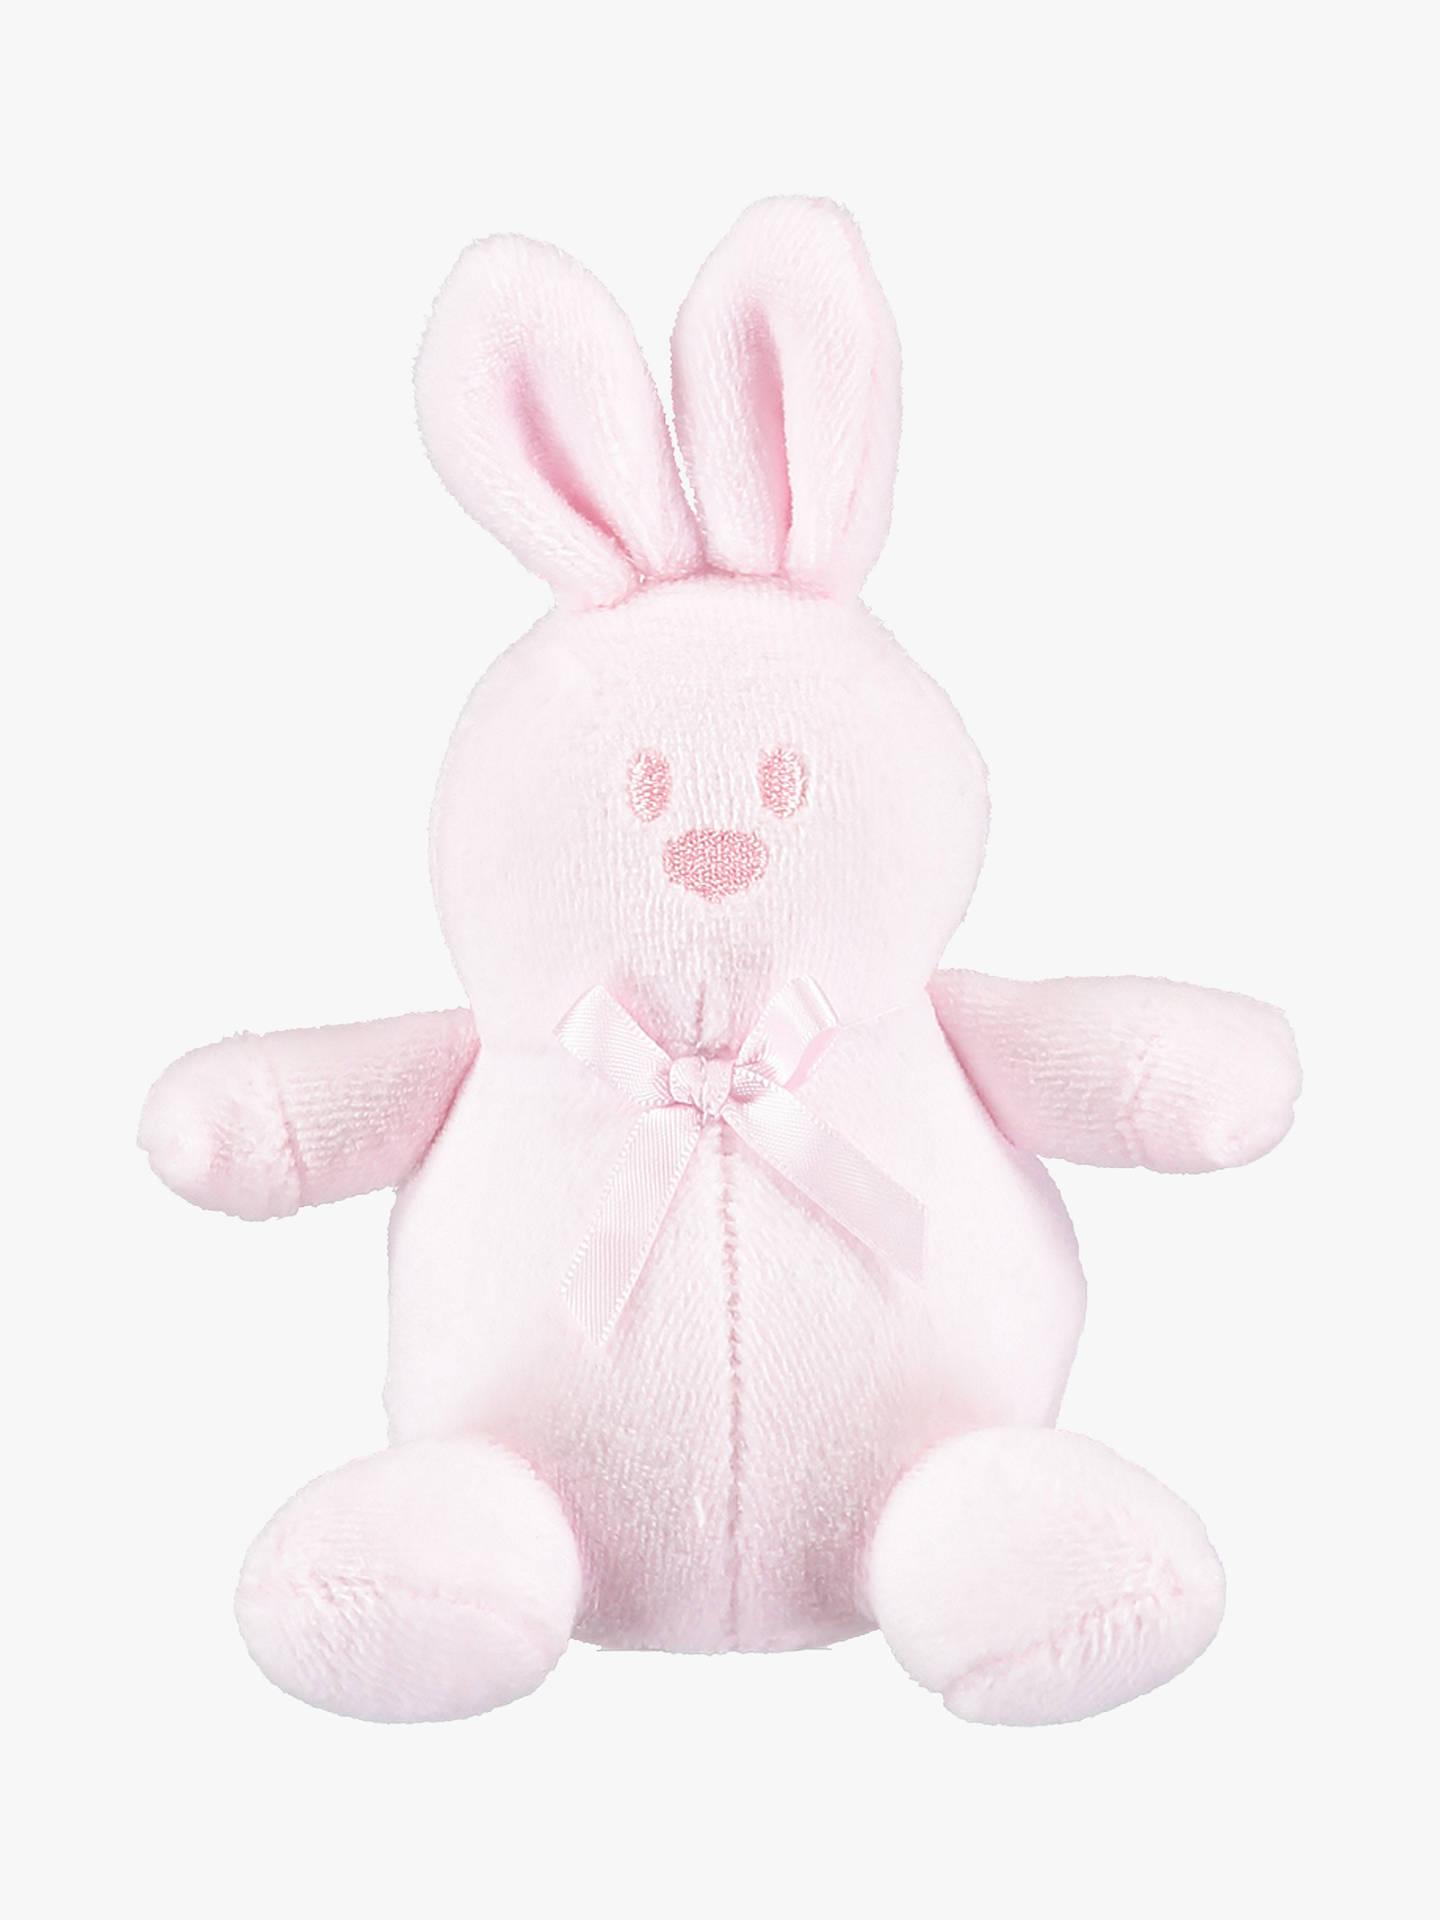 4f2266e39 ... Buy Emile et Rose Baby Phillipa Dress, Shorts and Teddy Bear Set, Light  Pink